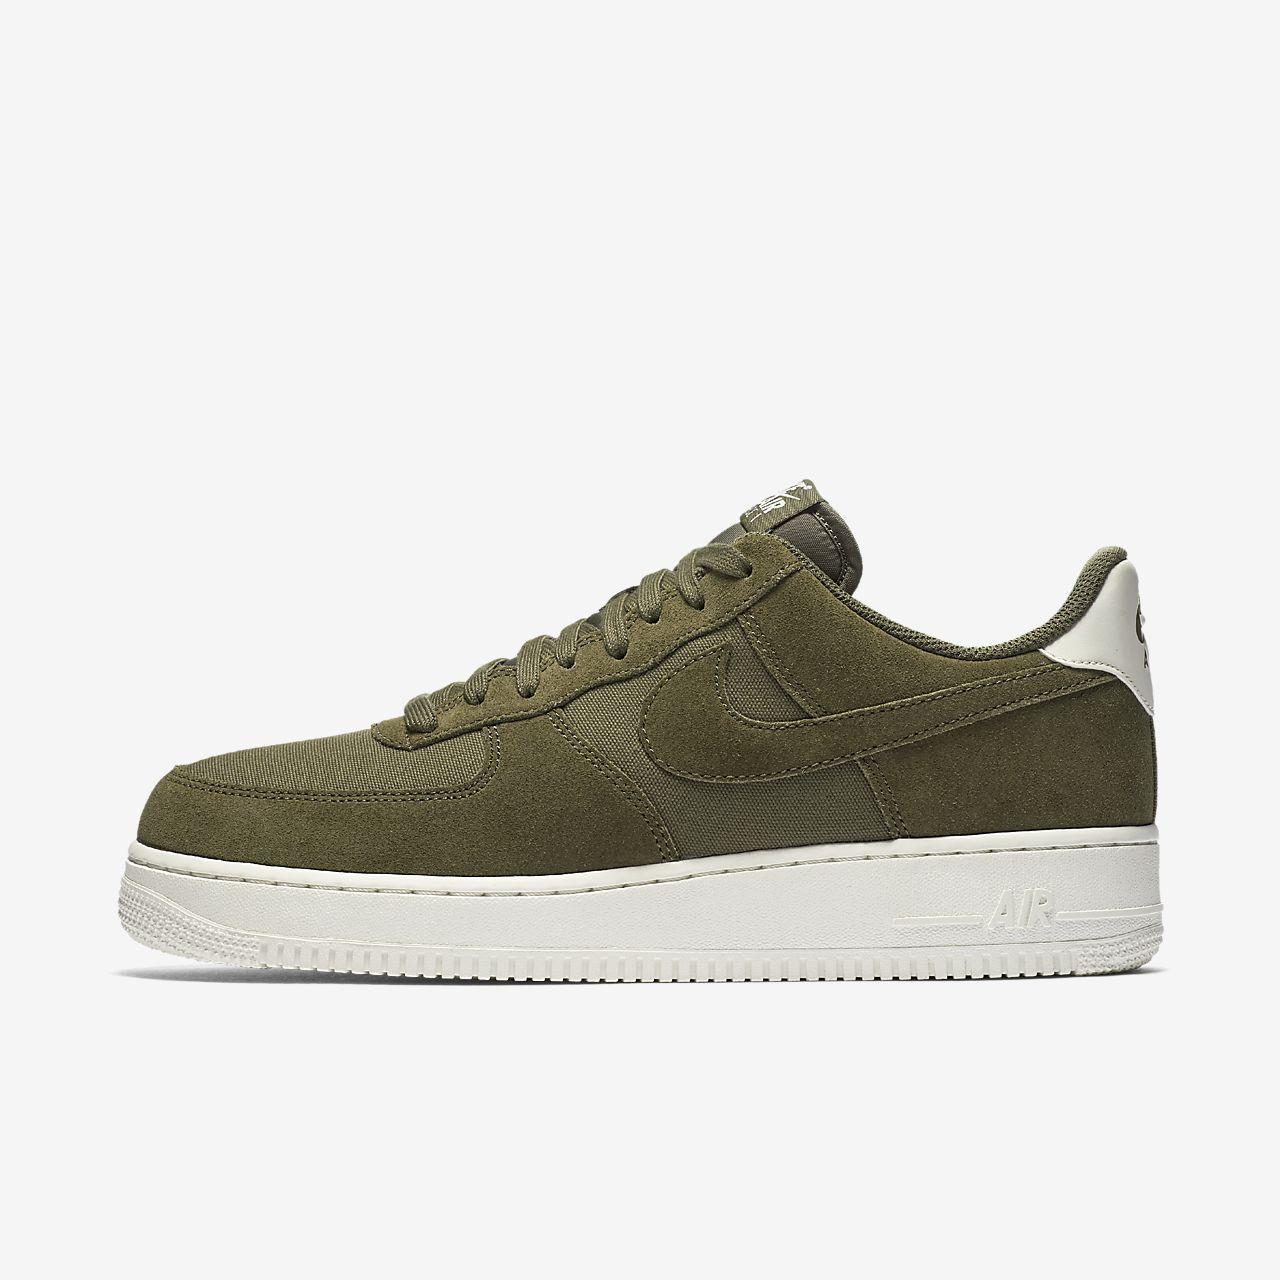 5920876100f695 Nike Air Force 1  07 Suede Men s Shoe. Nike.com NL